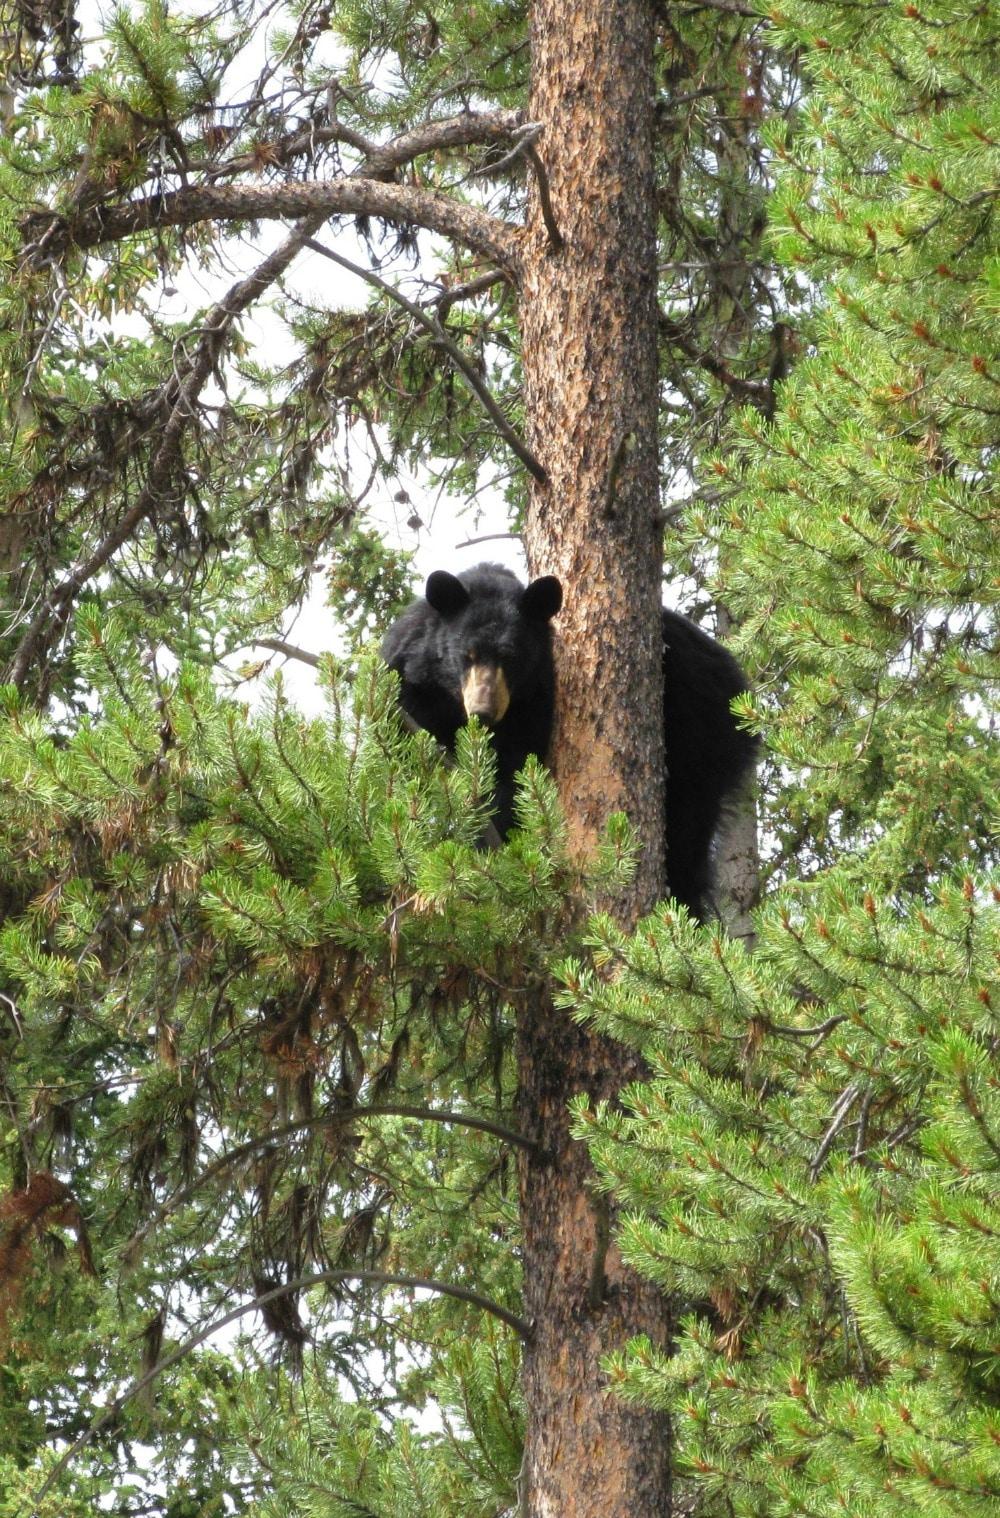 A black bear stuck in a tree at Johnston Canyon #hike #bear #Banff #Canada